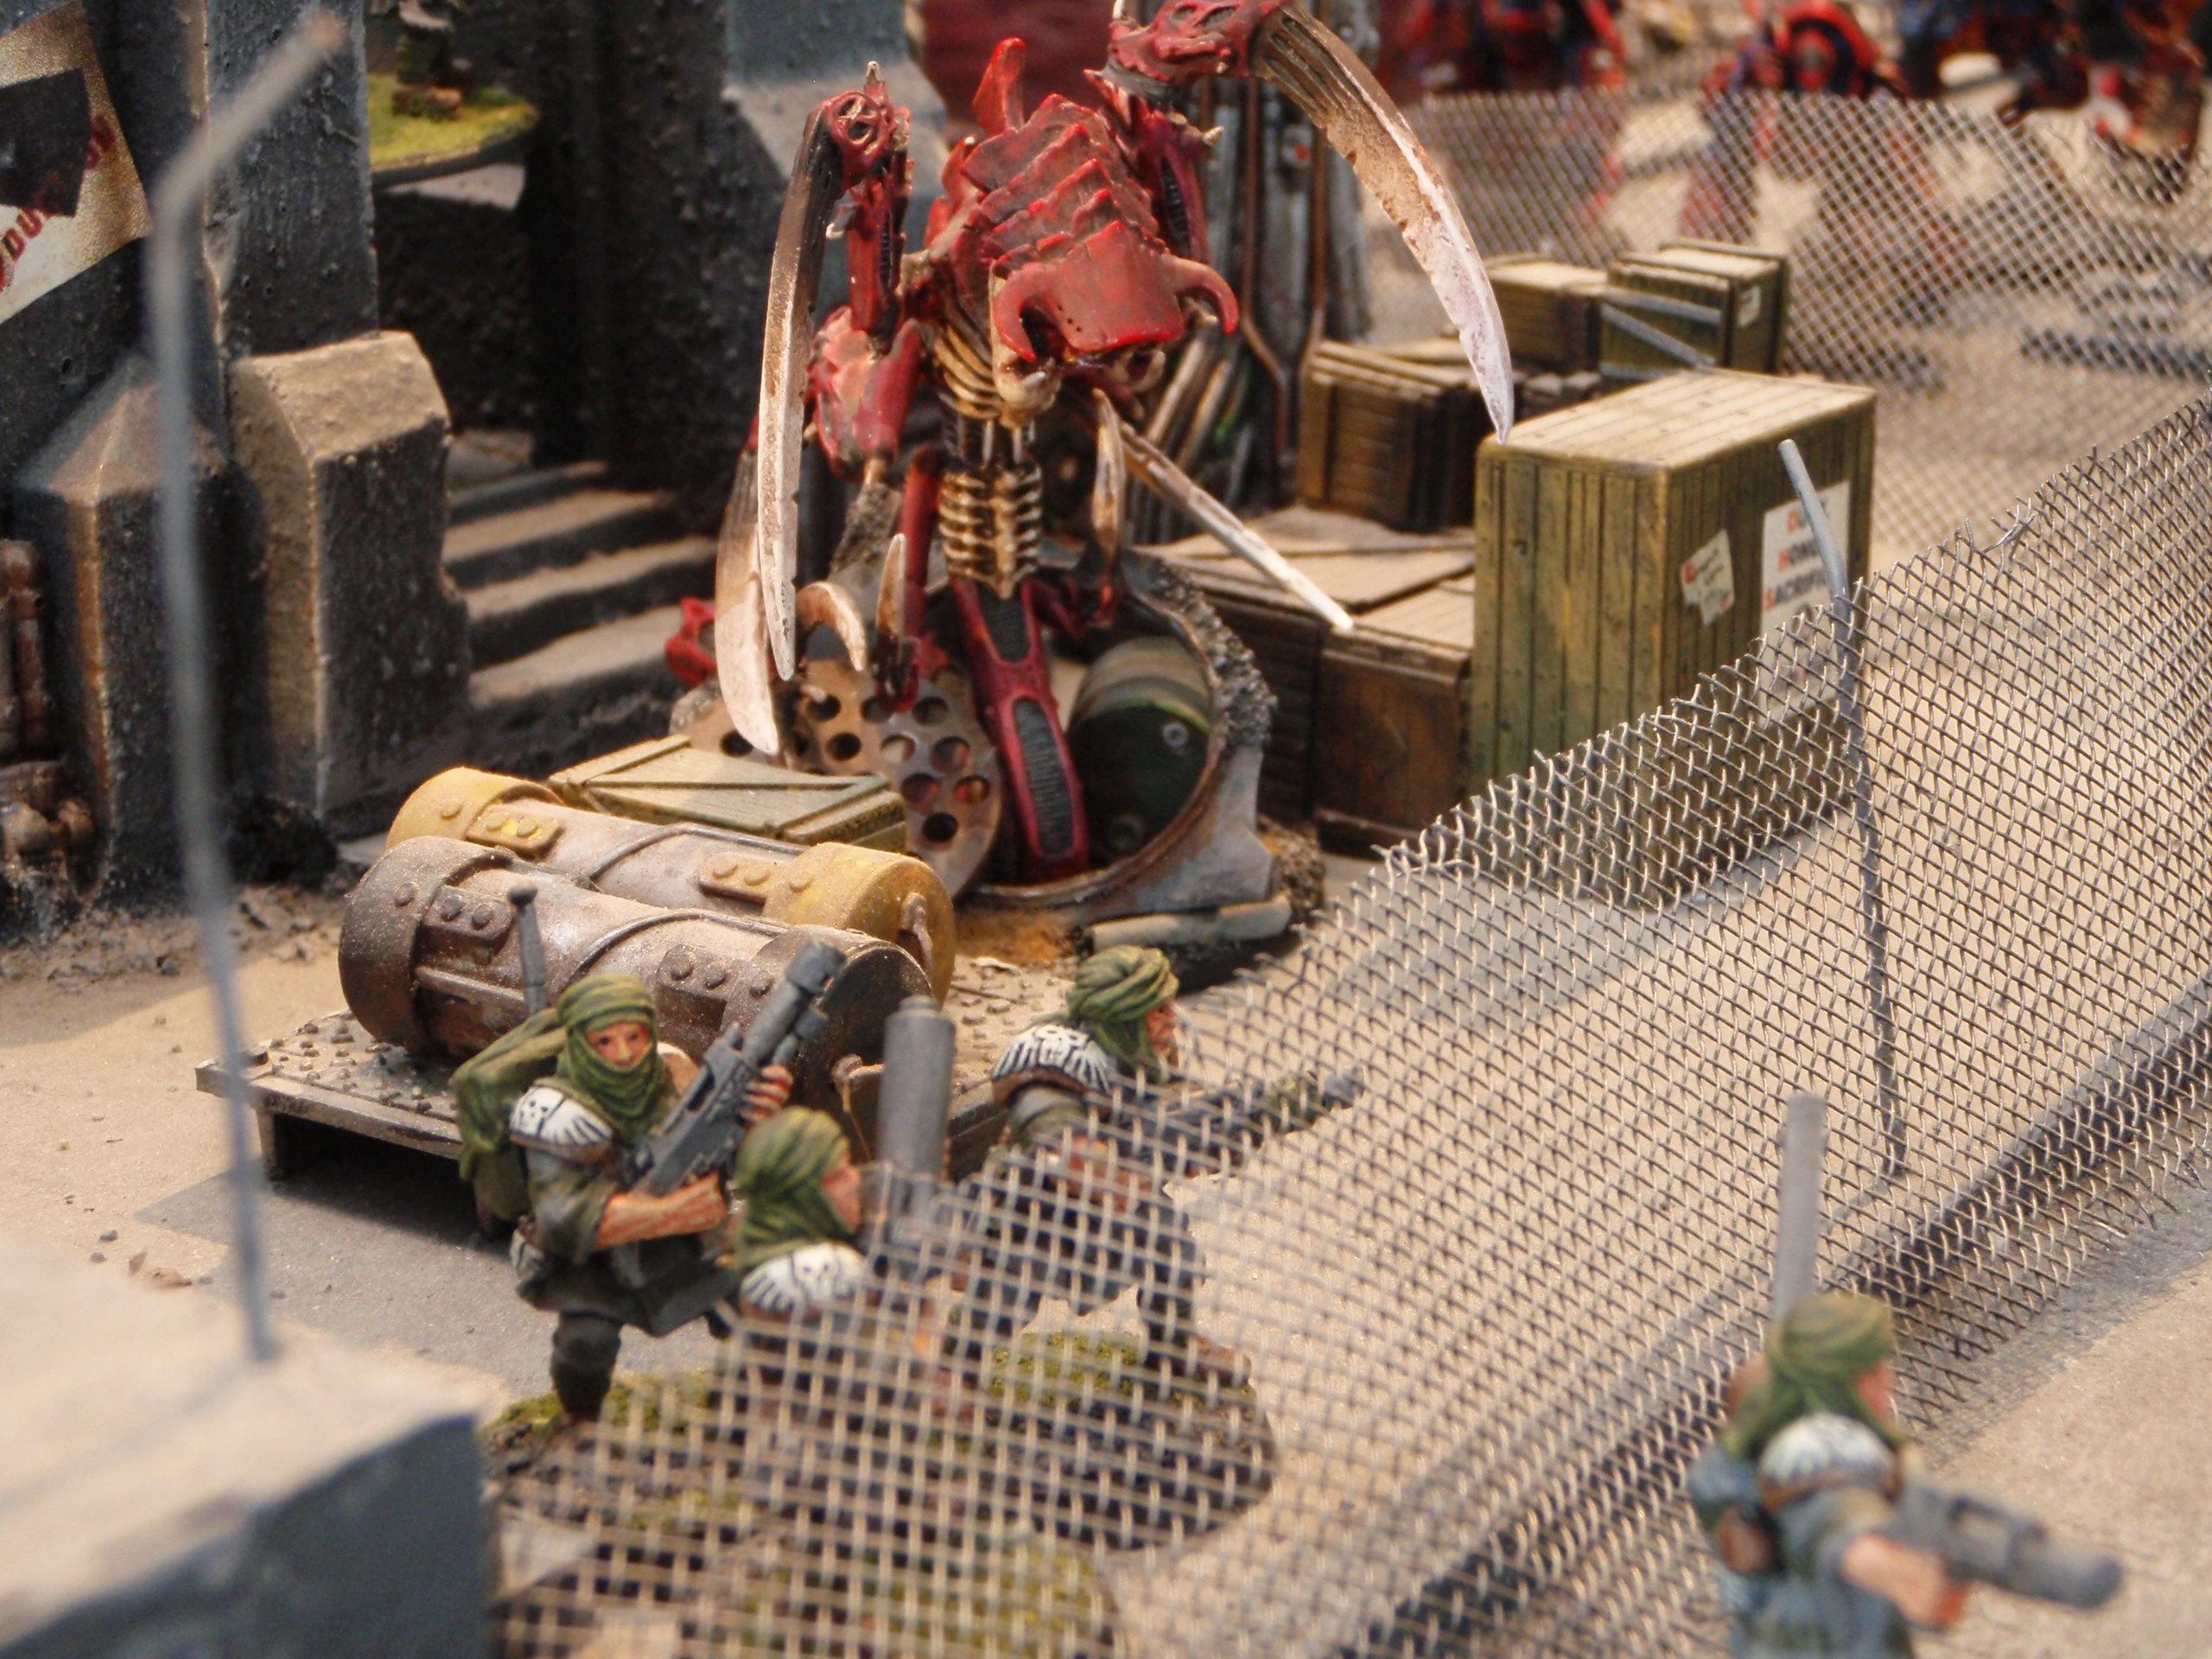 Lictor, Red Terror, Tyranids, Warhammer 40,000